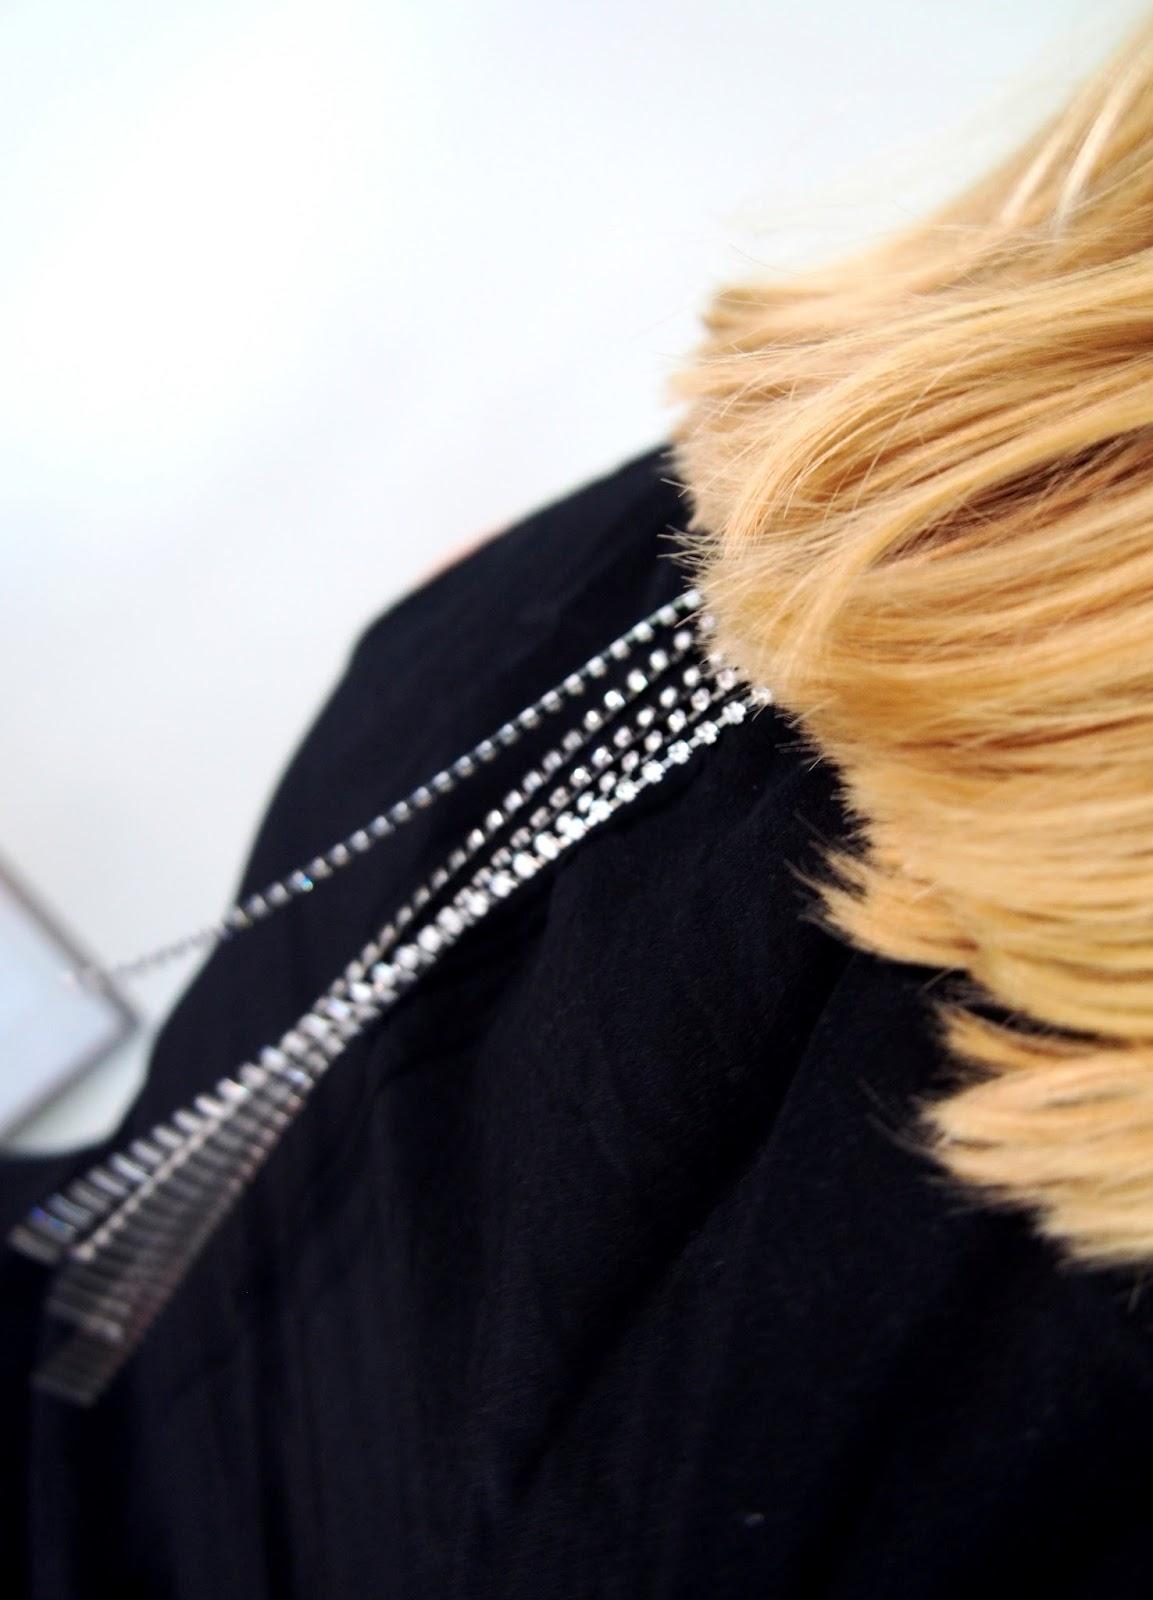 silver bra back top black musta rintaliivit toppi hiukset blonde blondi detail yksityiskohta